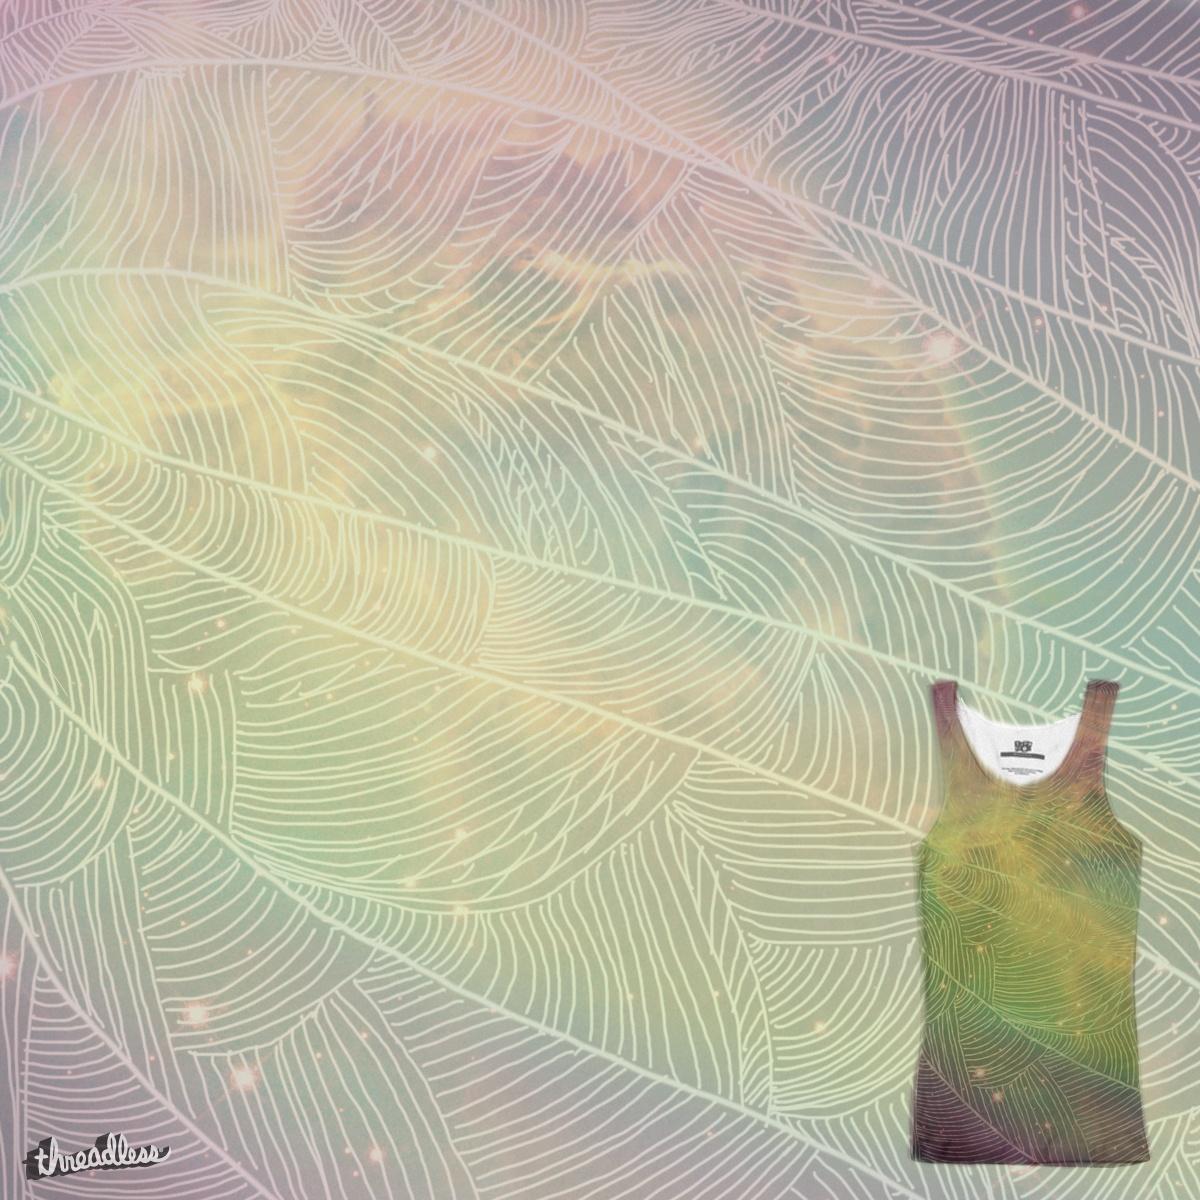 Galaxy Doodle by Erika Webber on Threadless